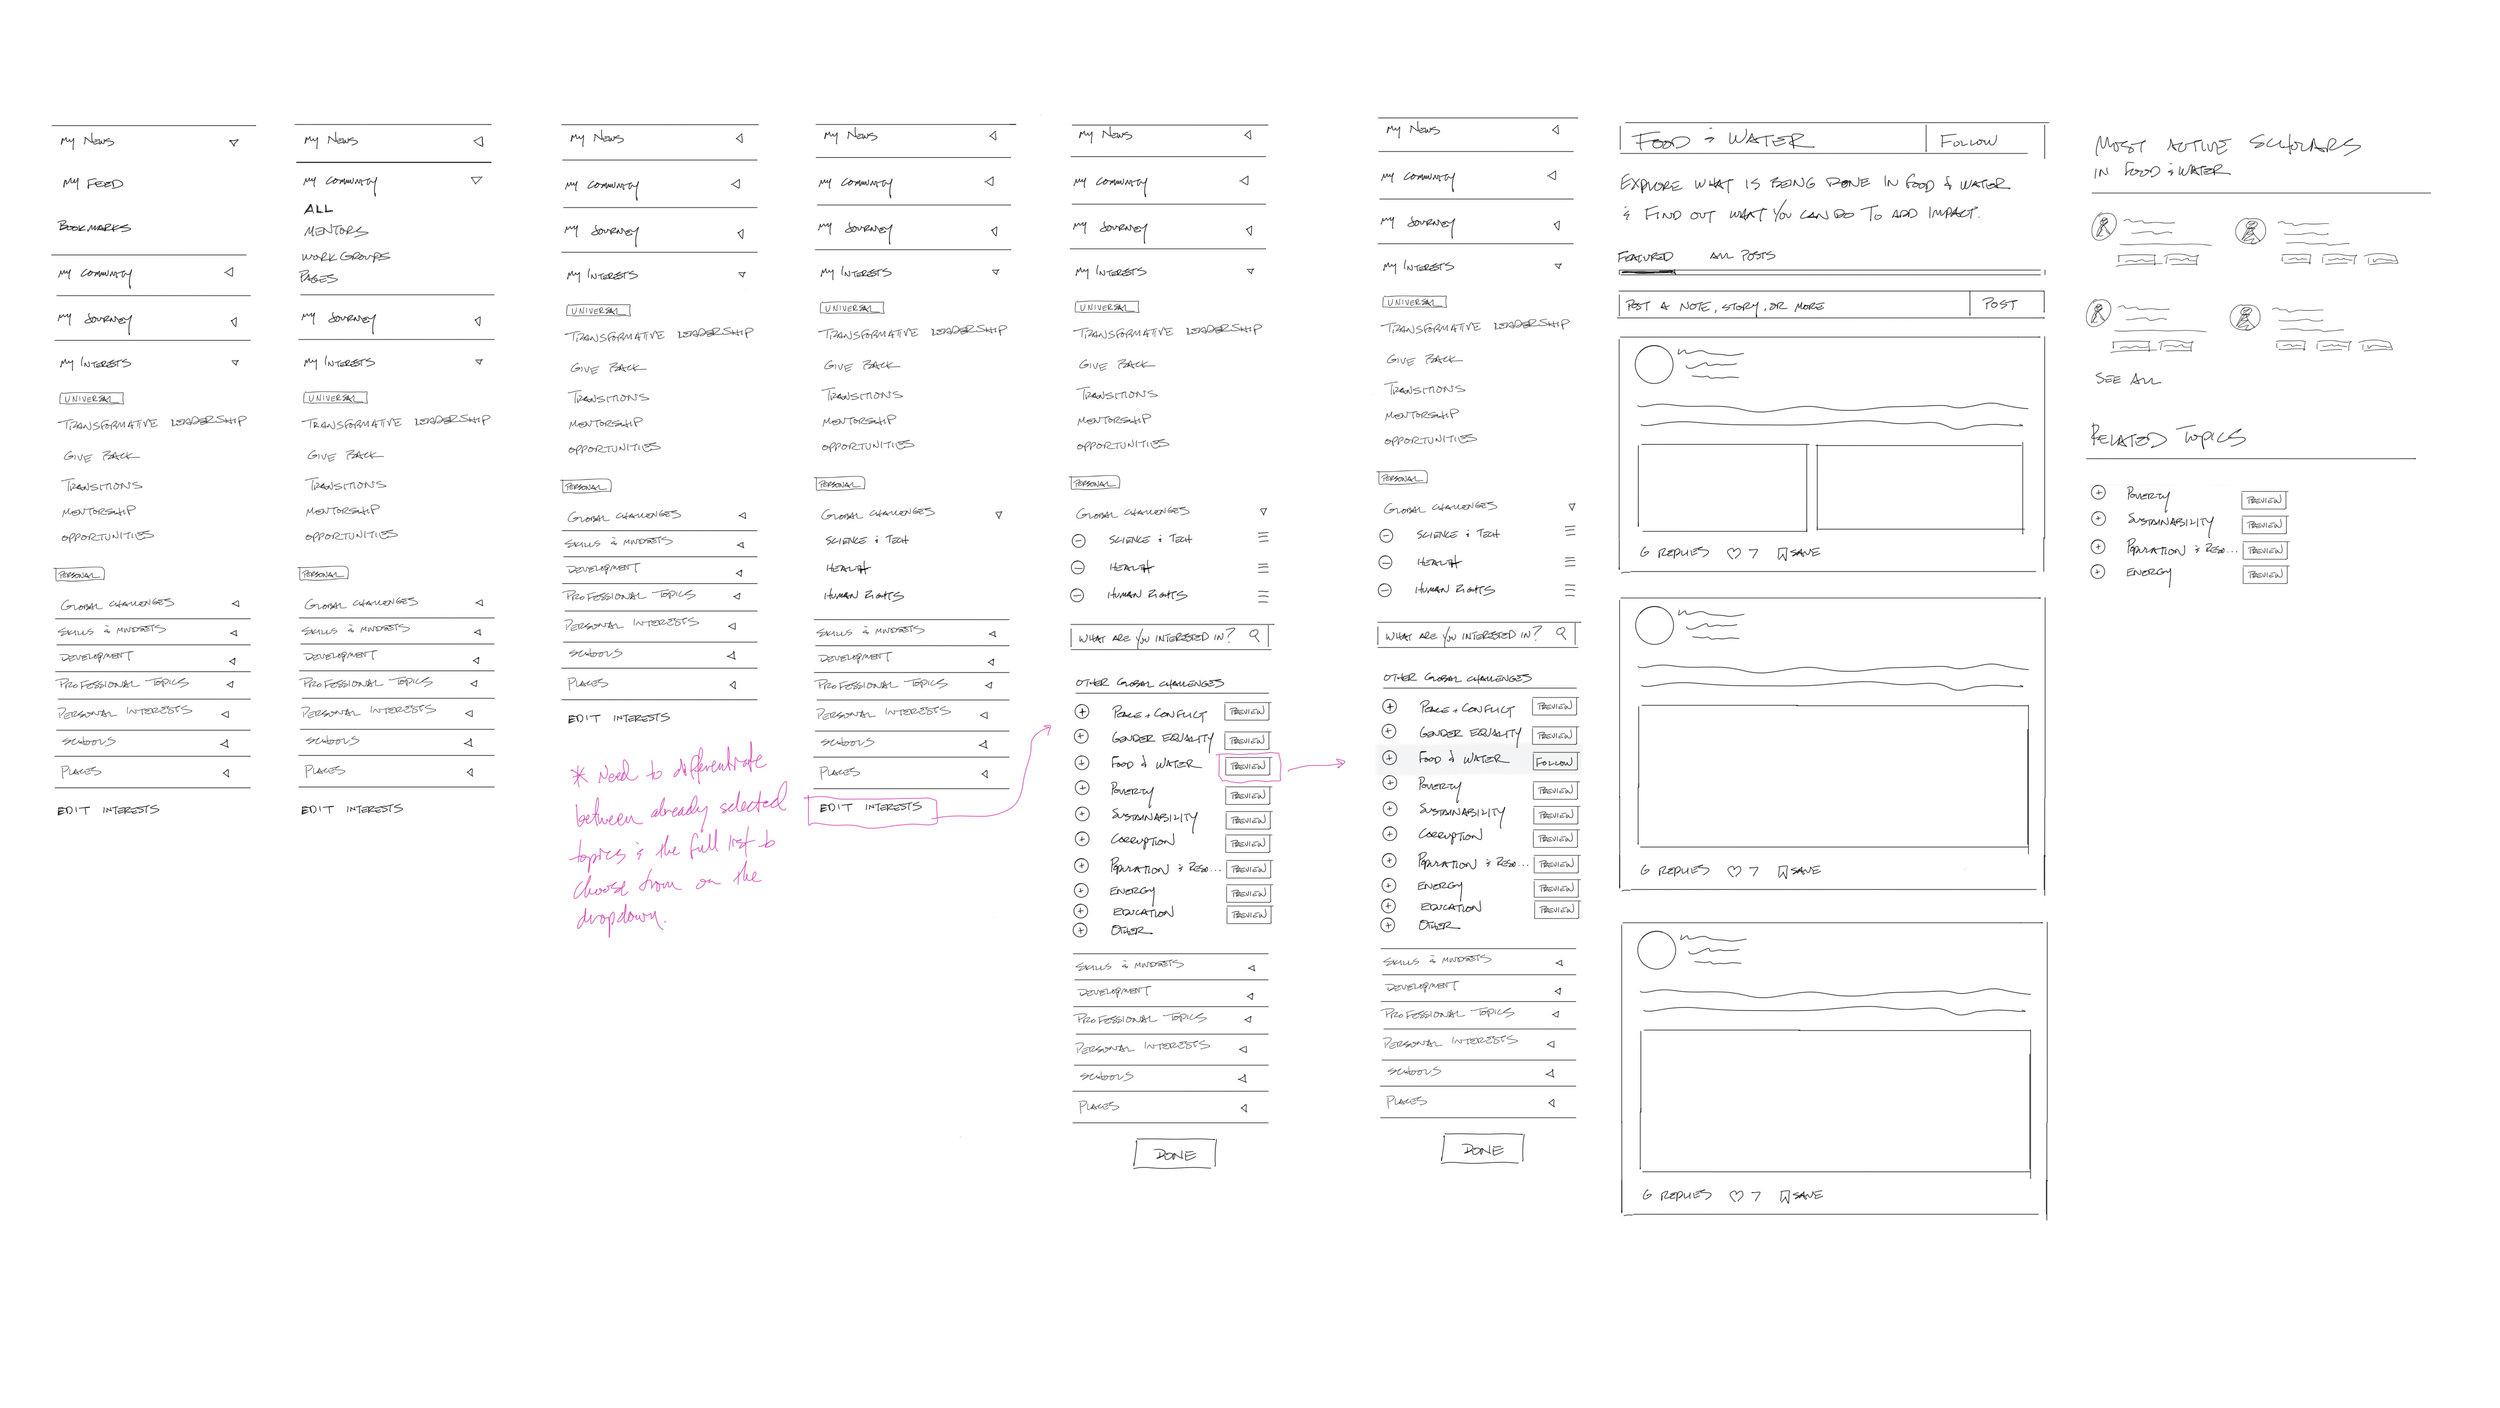 Nav_Scalability_01.jpg